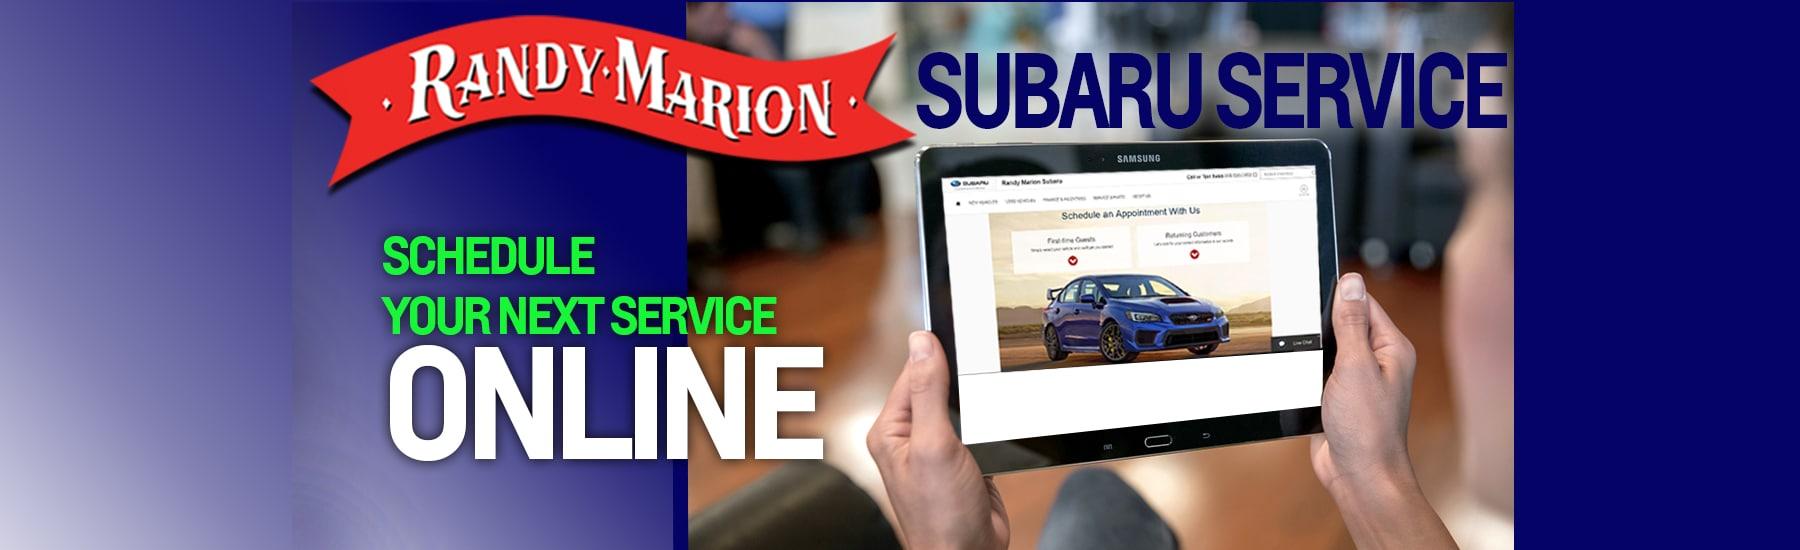 Randy Marion Subaru >> Randy Marion Subaru | New 2018-2019 Subaru & Used Car ...